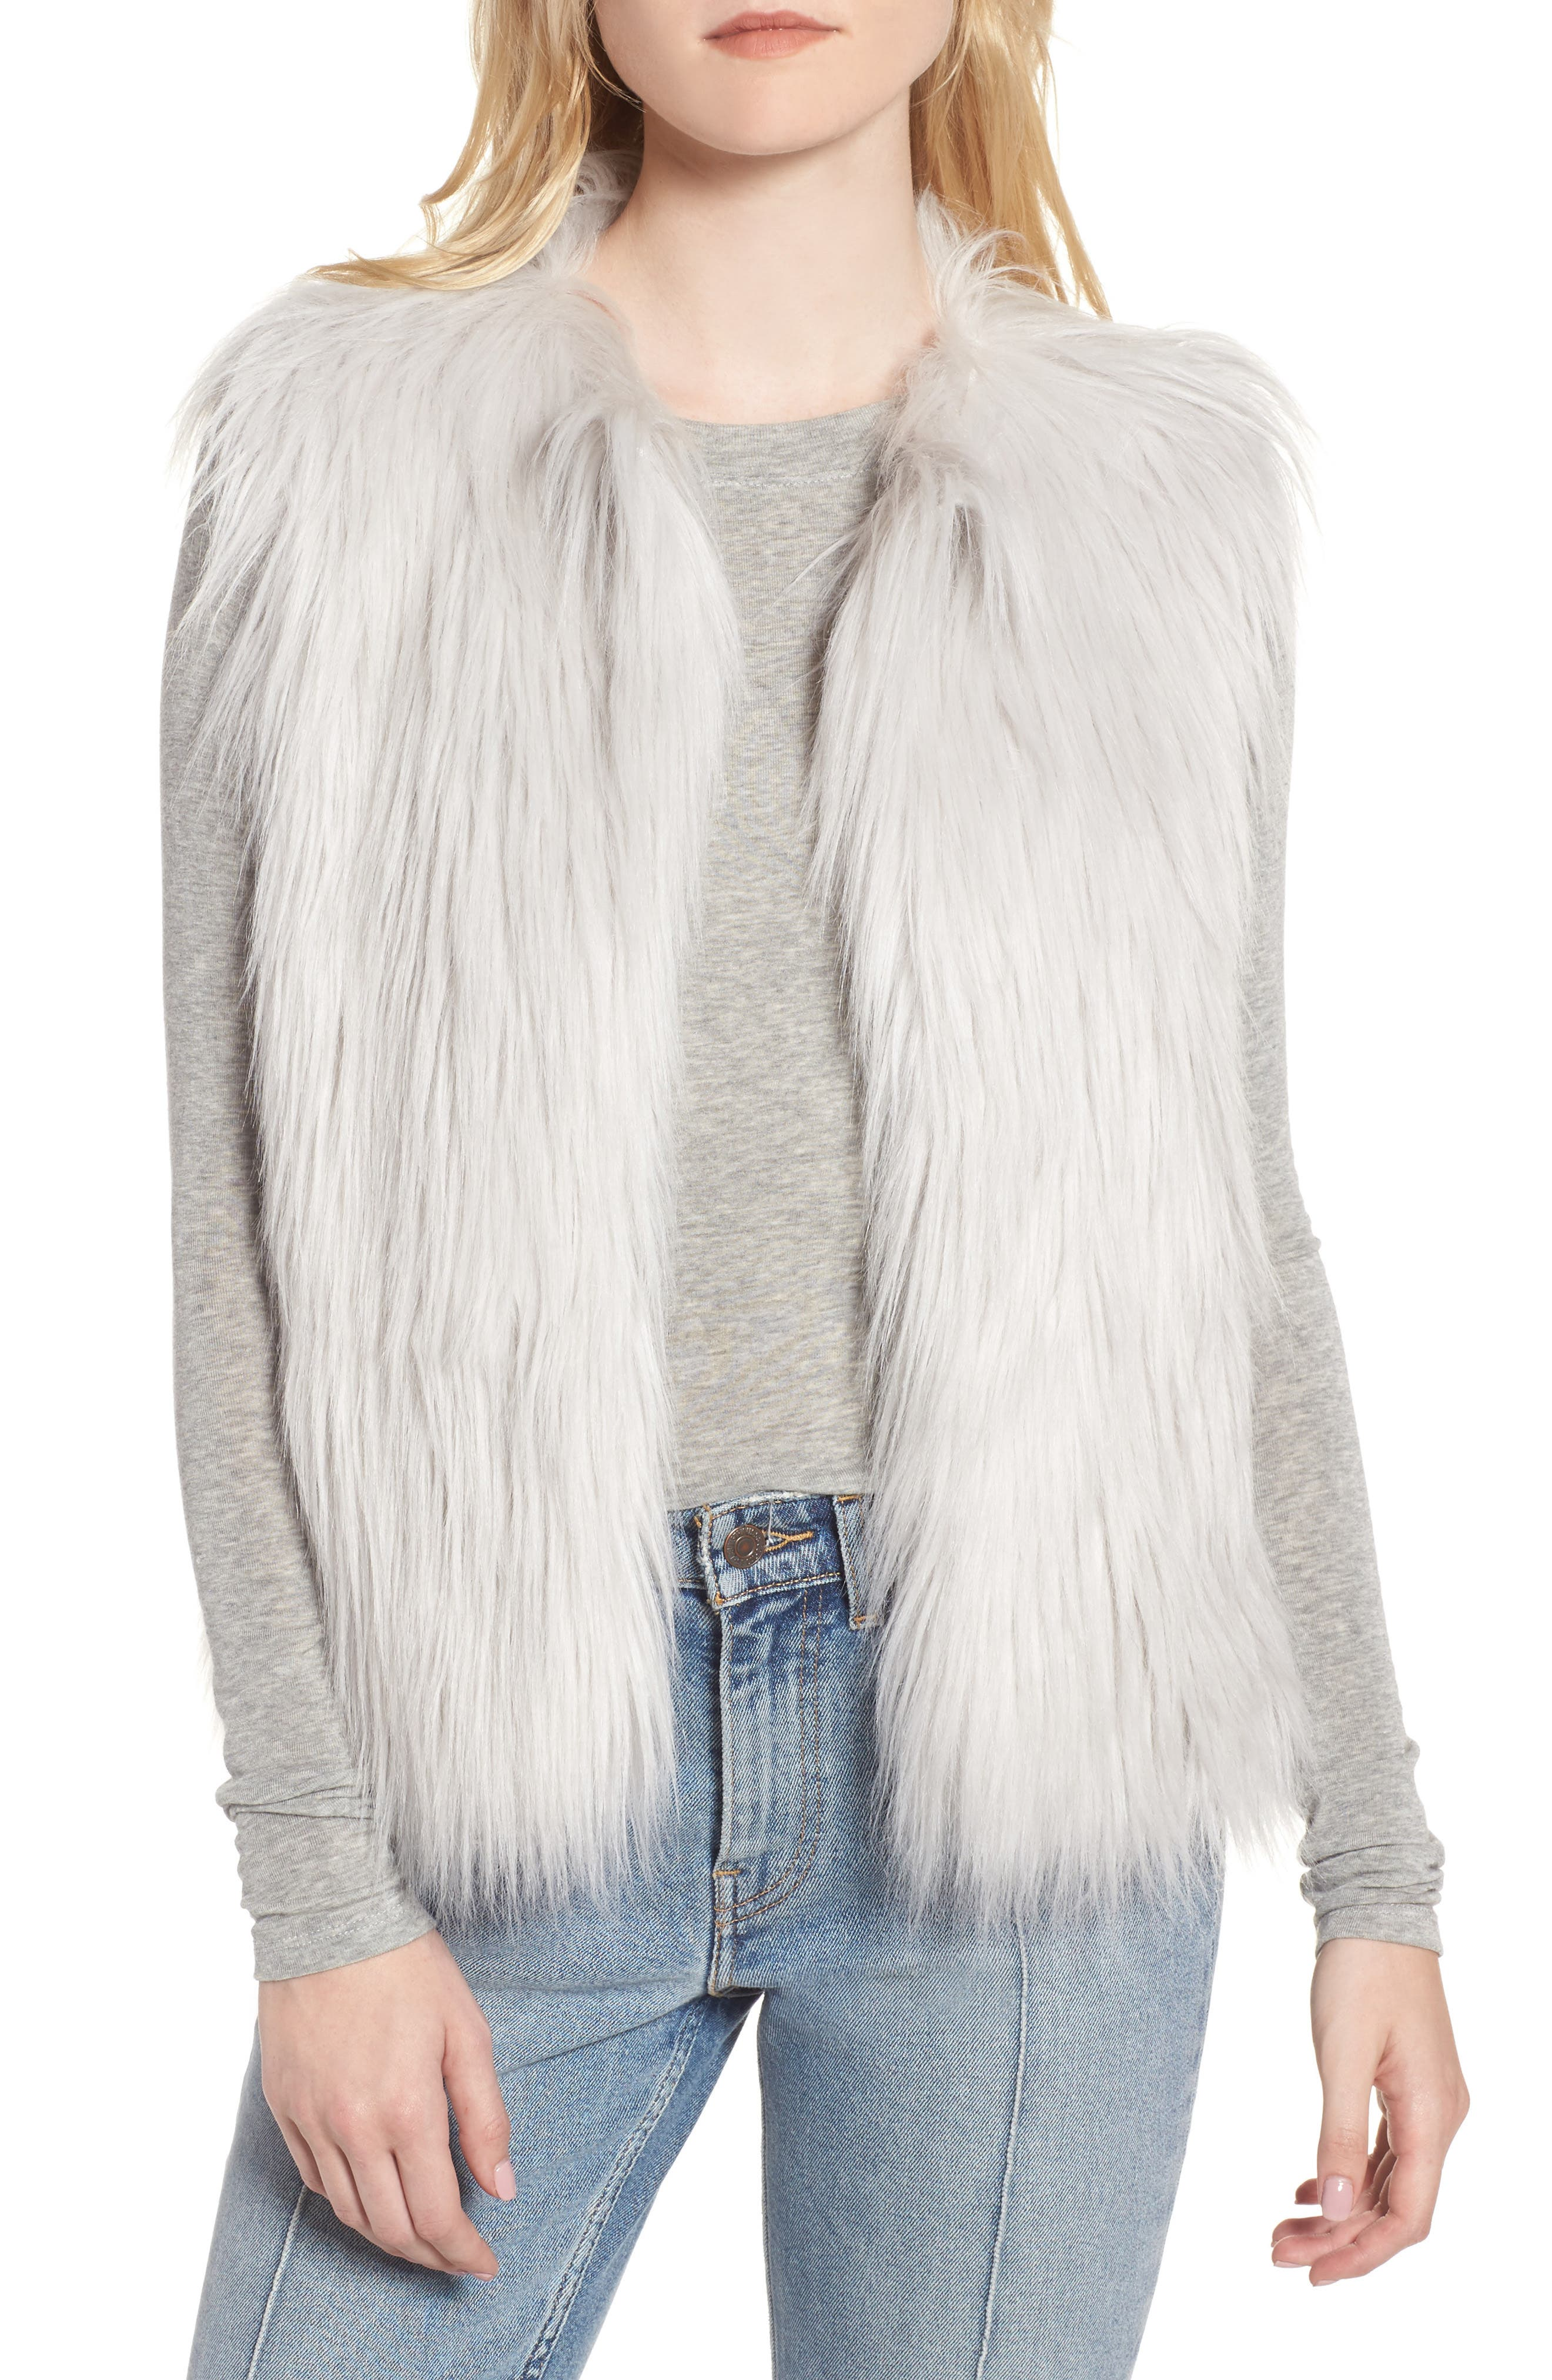 Heurueh Riko Faux Fur Vest